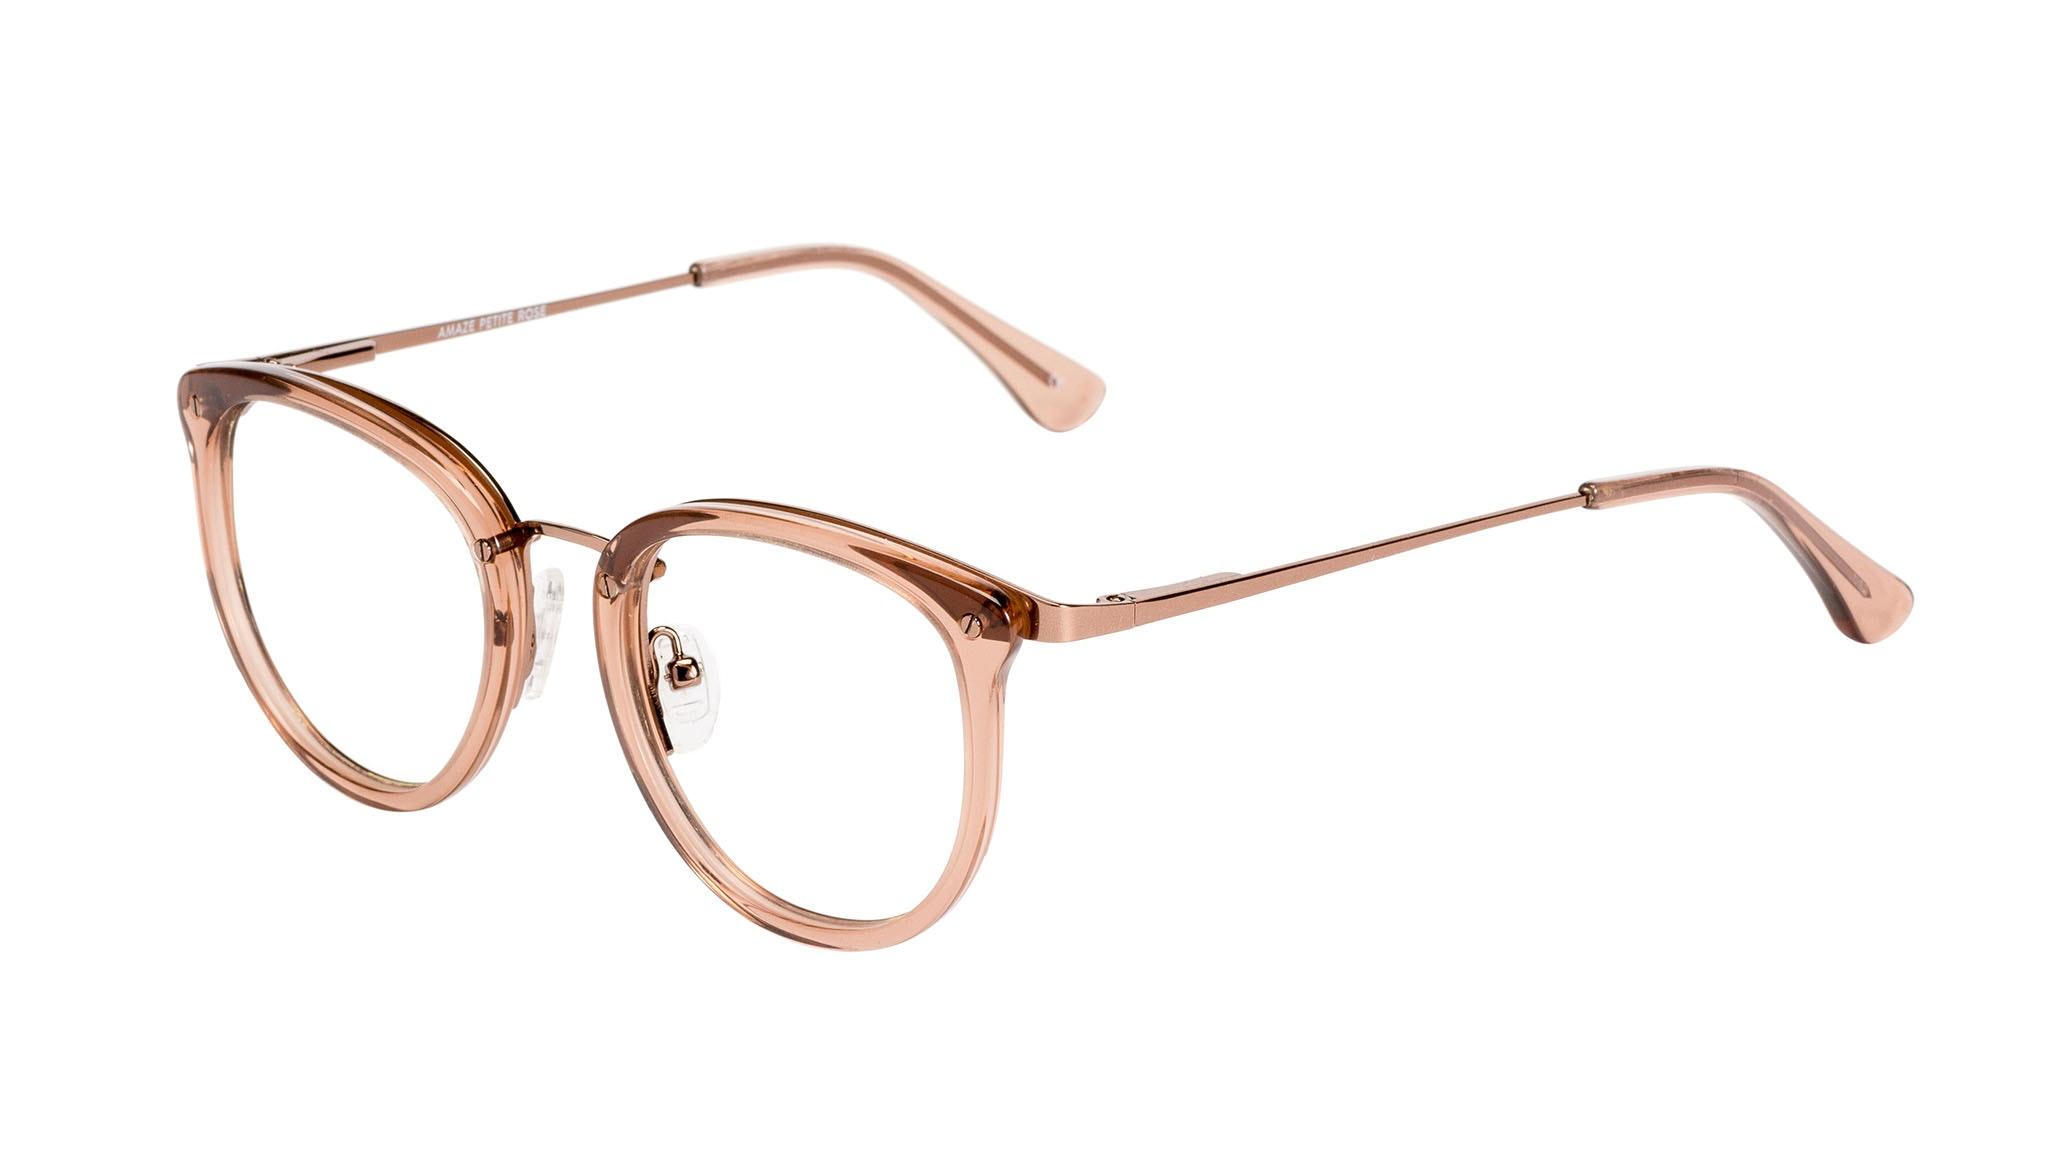 Affordable Fashion Glasses Round Eyeglasses Women Amaze Petite Rose  Tilt